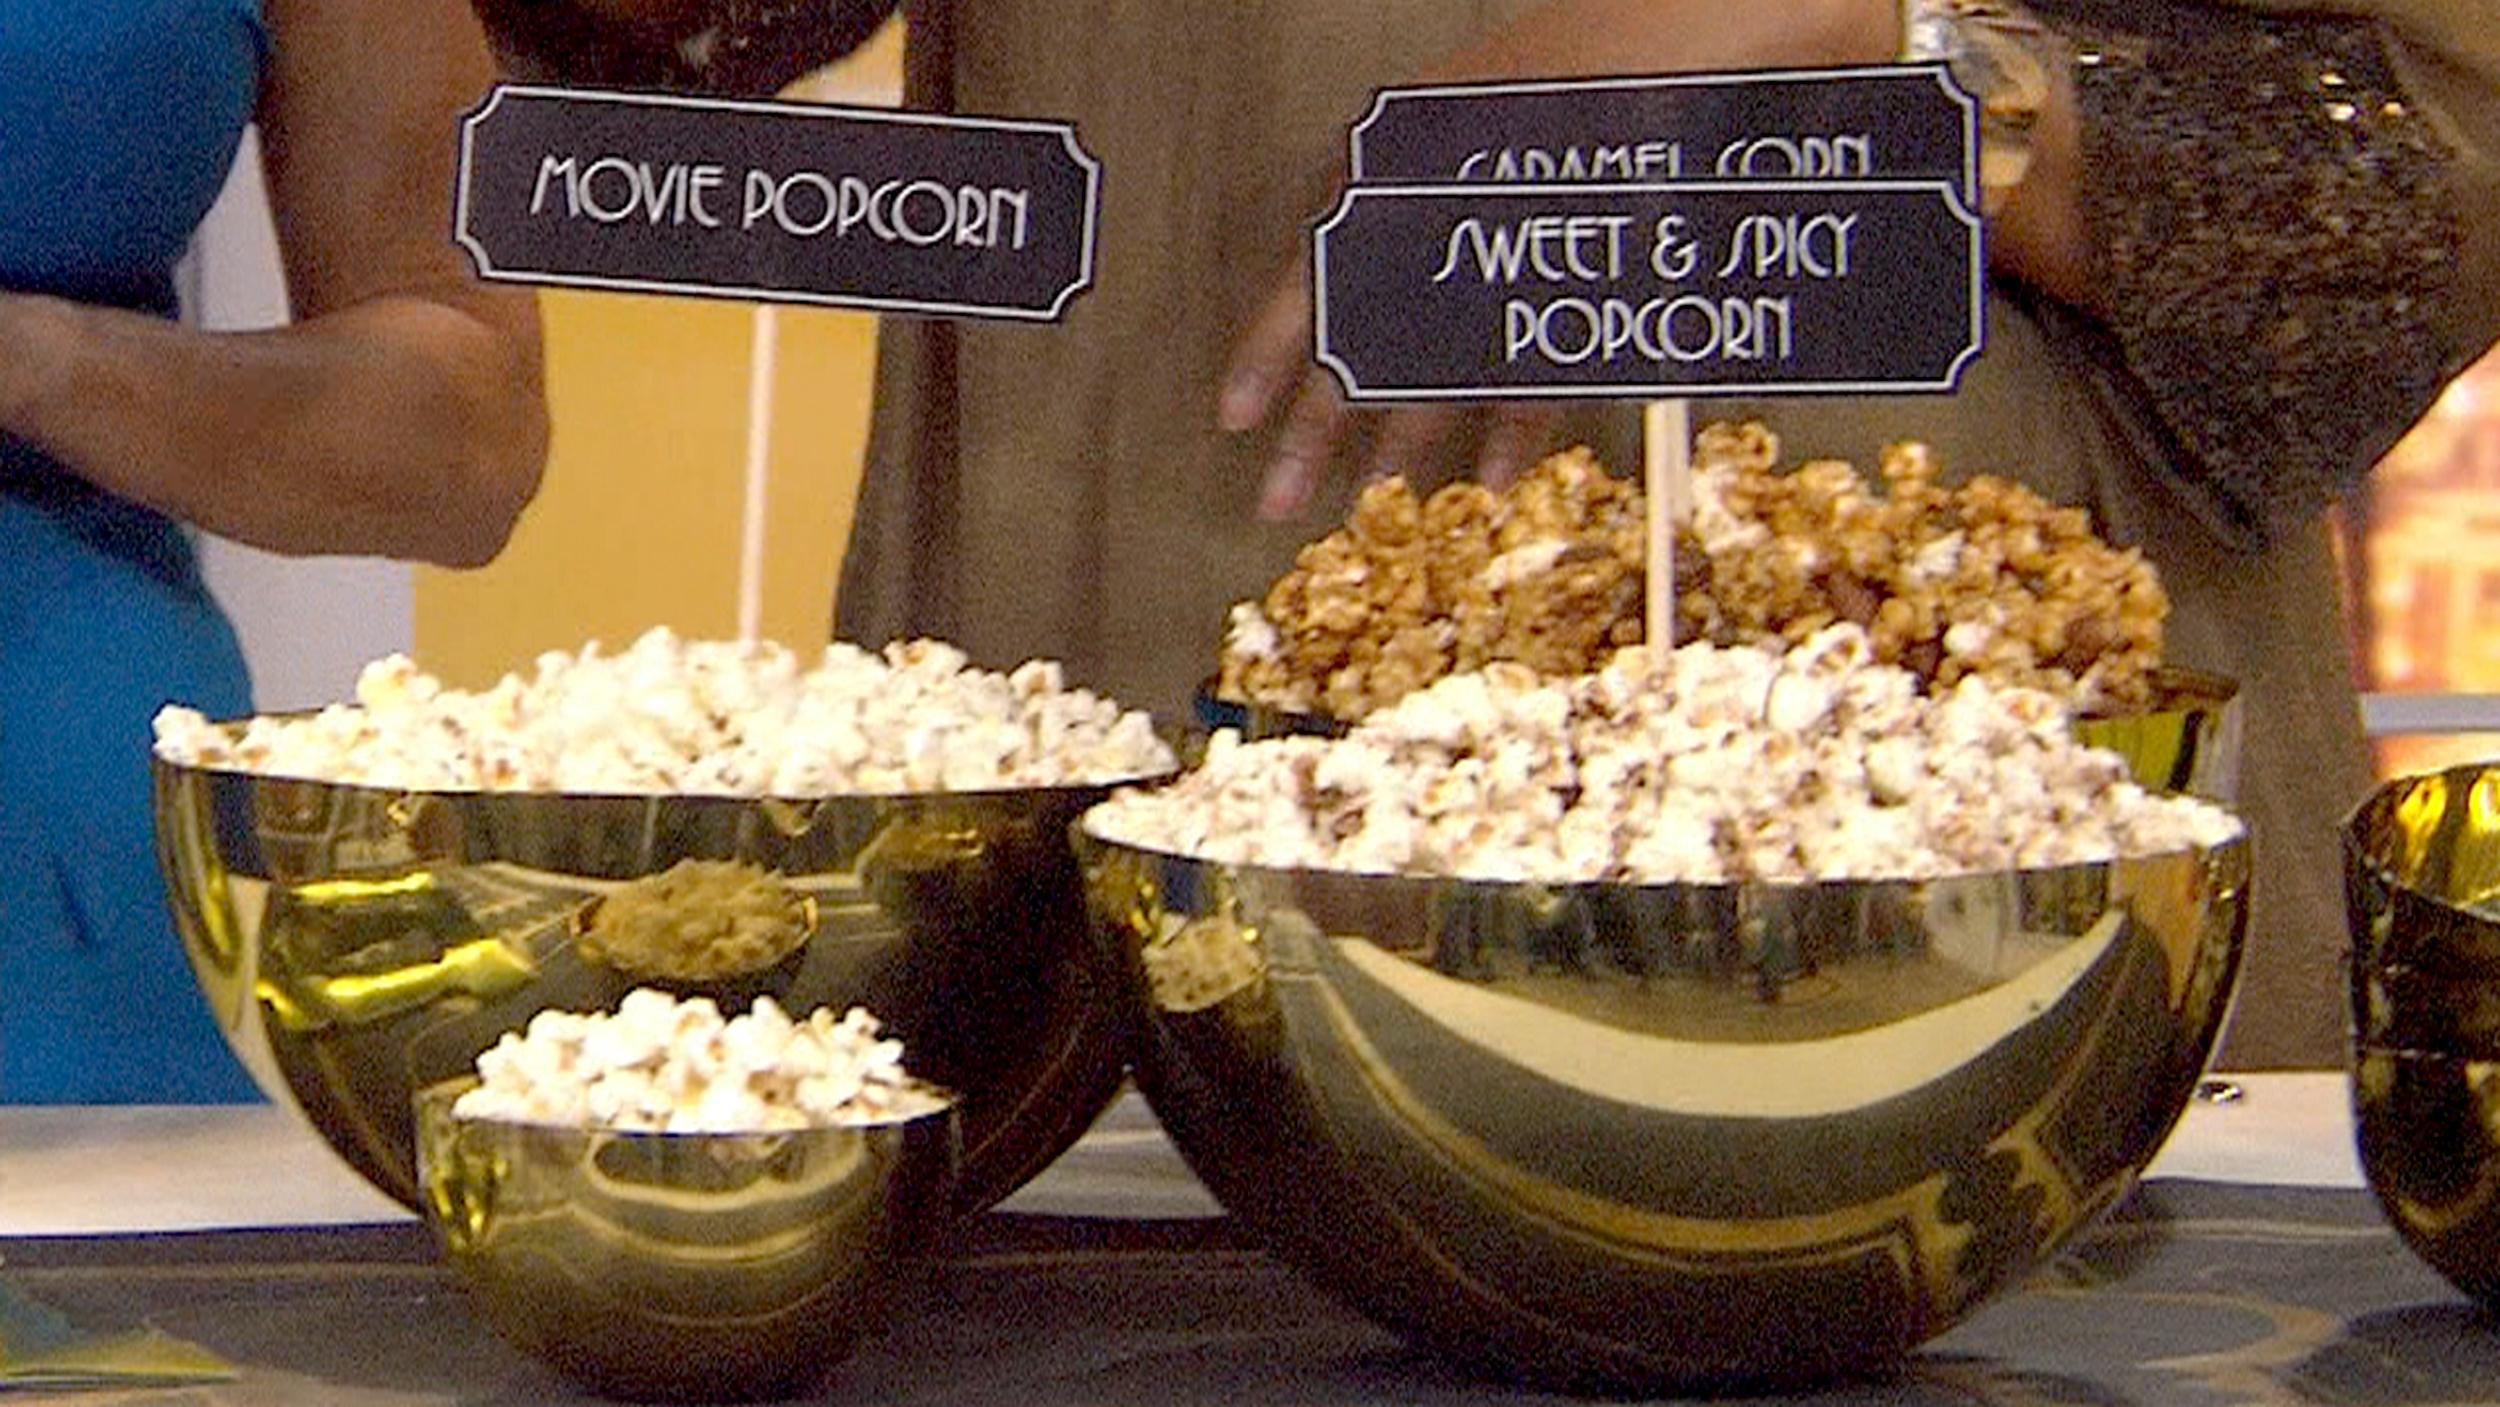 Academy Award Winning Popcorn And Cocktail Recipes